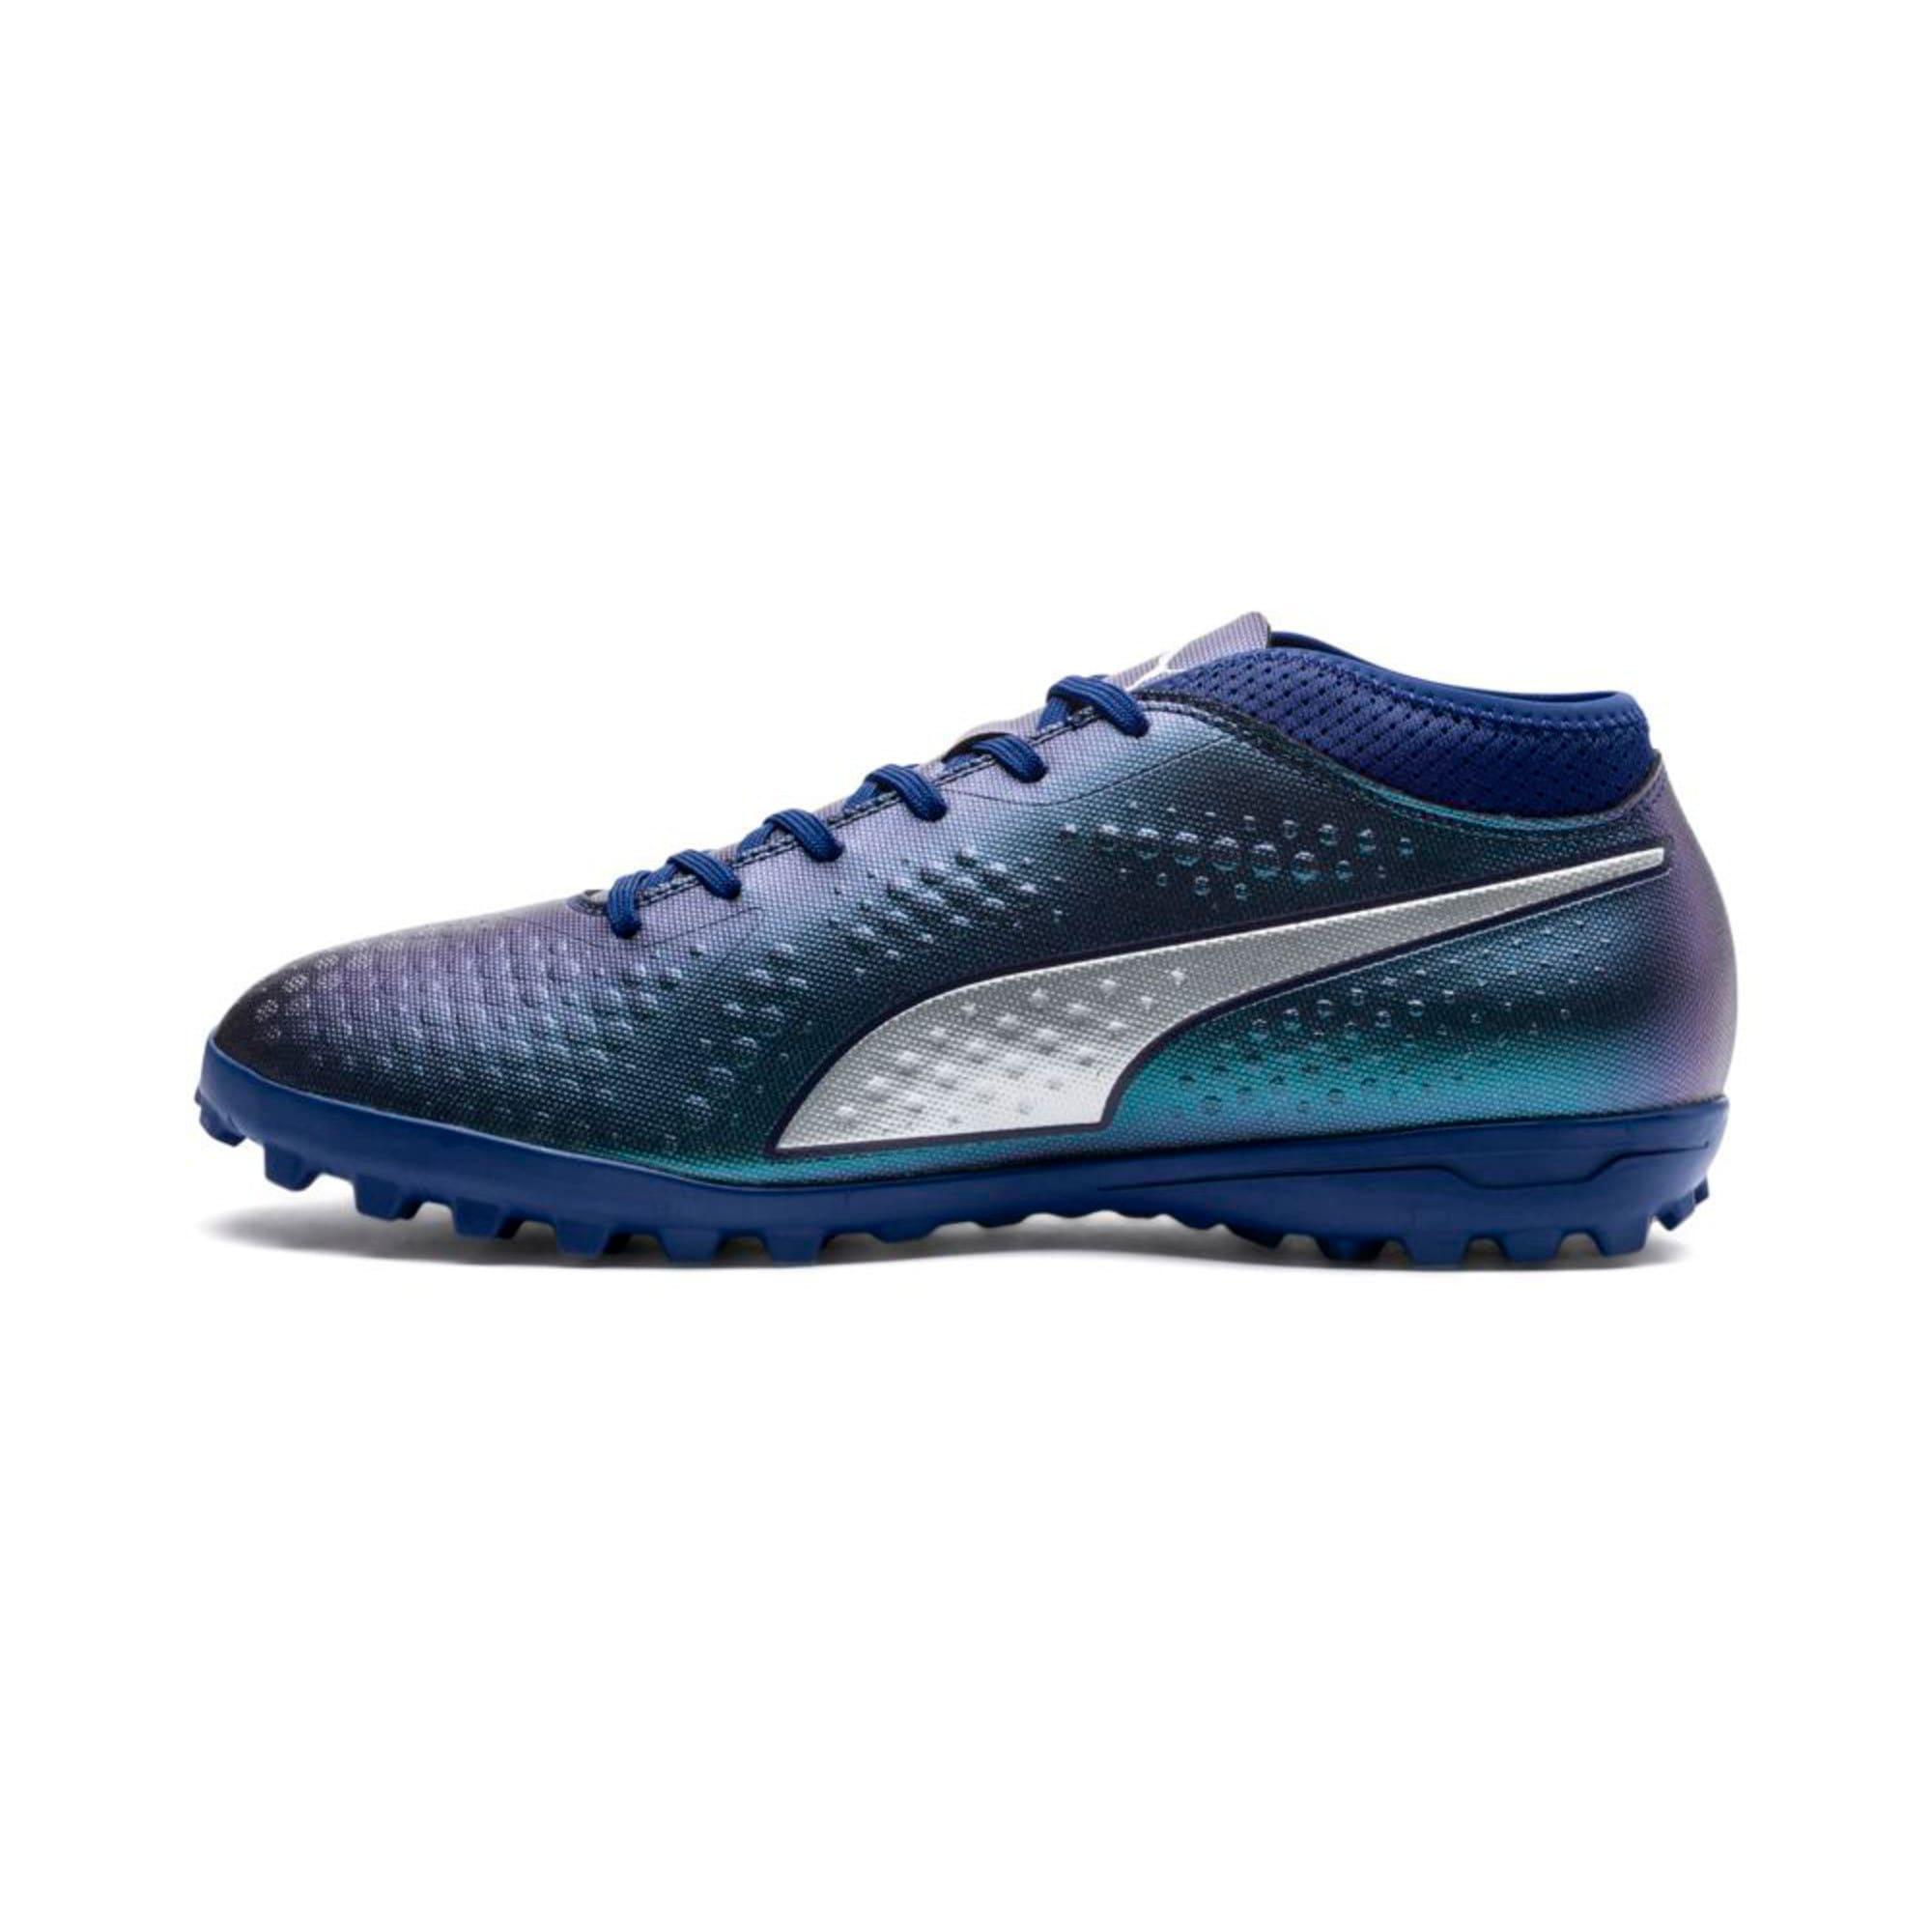 Thumbnail 1 of PUMA ONE 4 Synthetic TT Men's Football Boots, Sodalite Blue-Silver-Peacoat, medium-IND